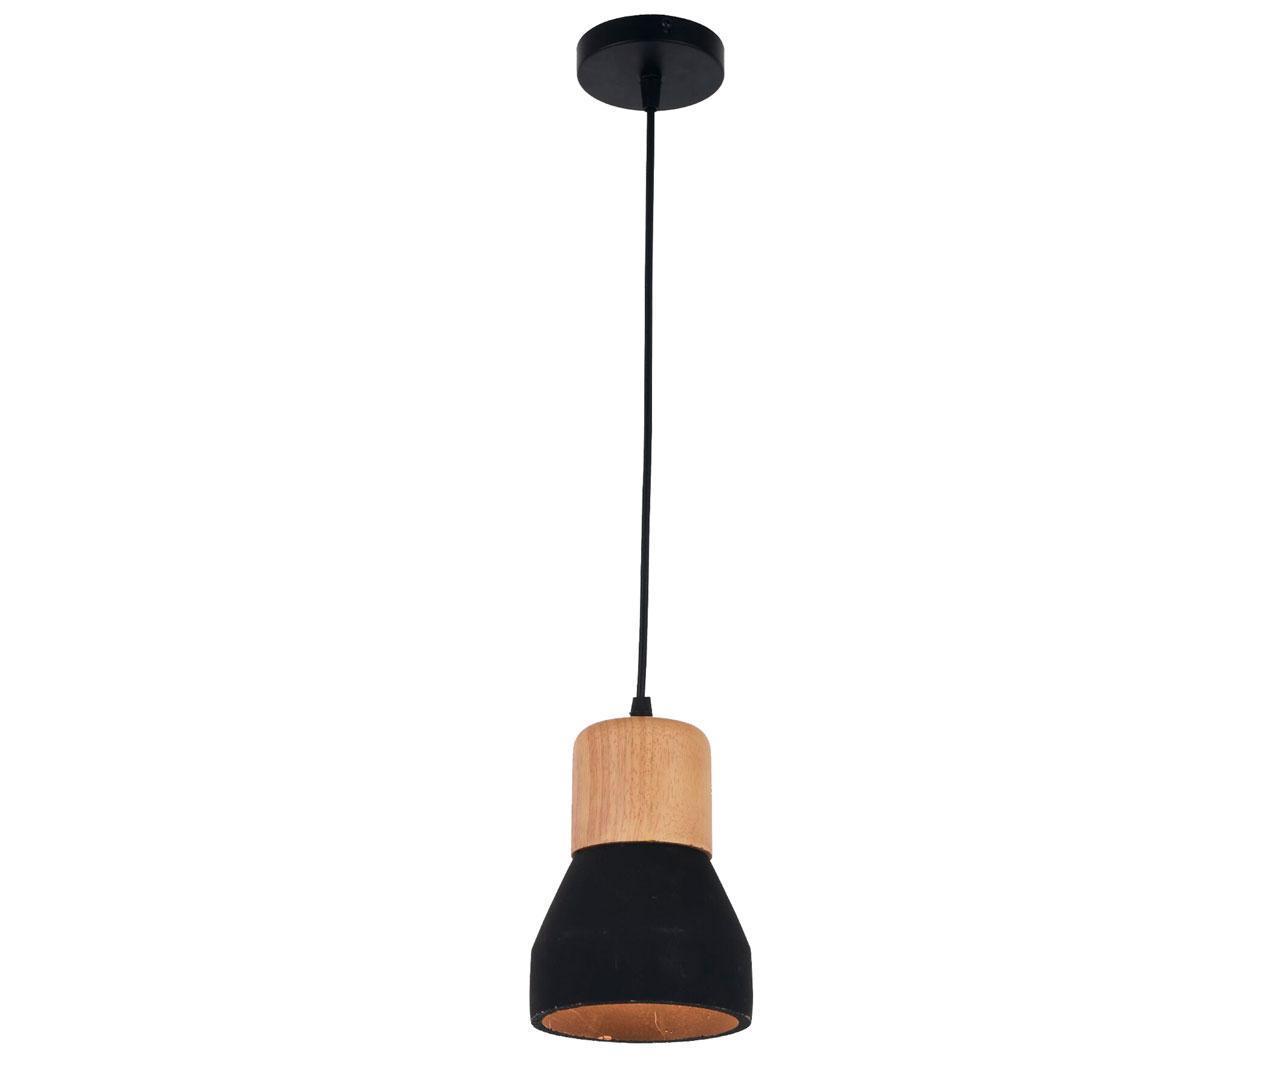 цена на Подвесной светильник Kink Light Фаро 08313,19